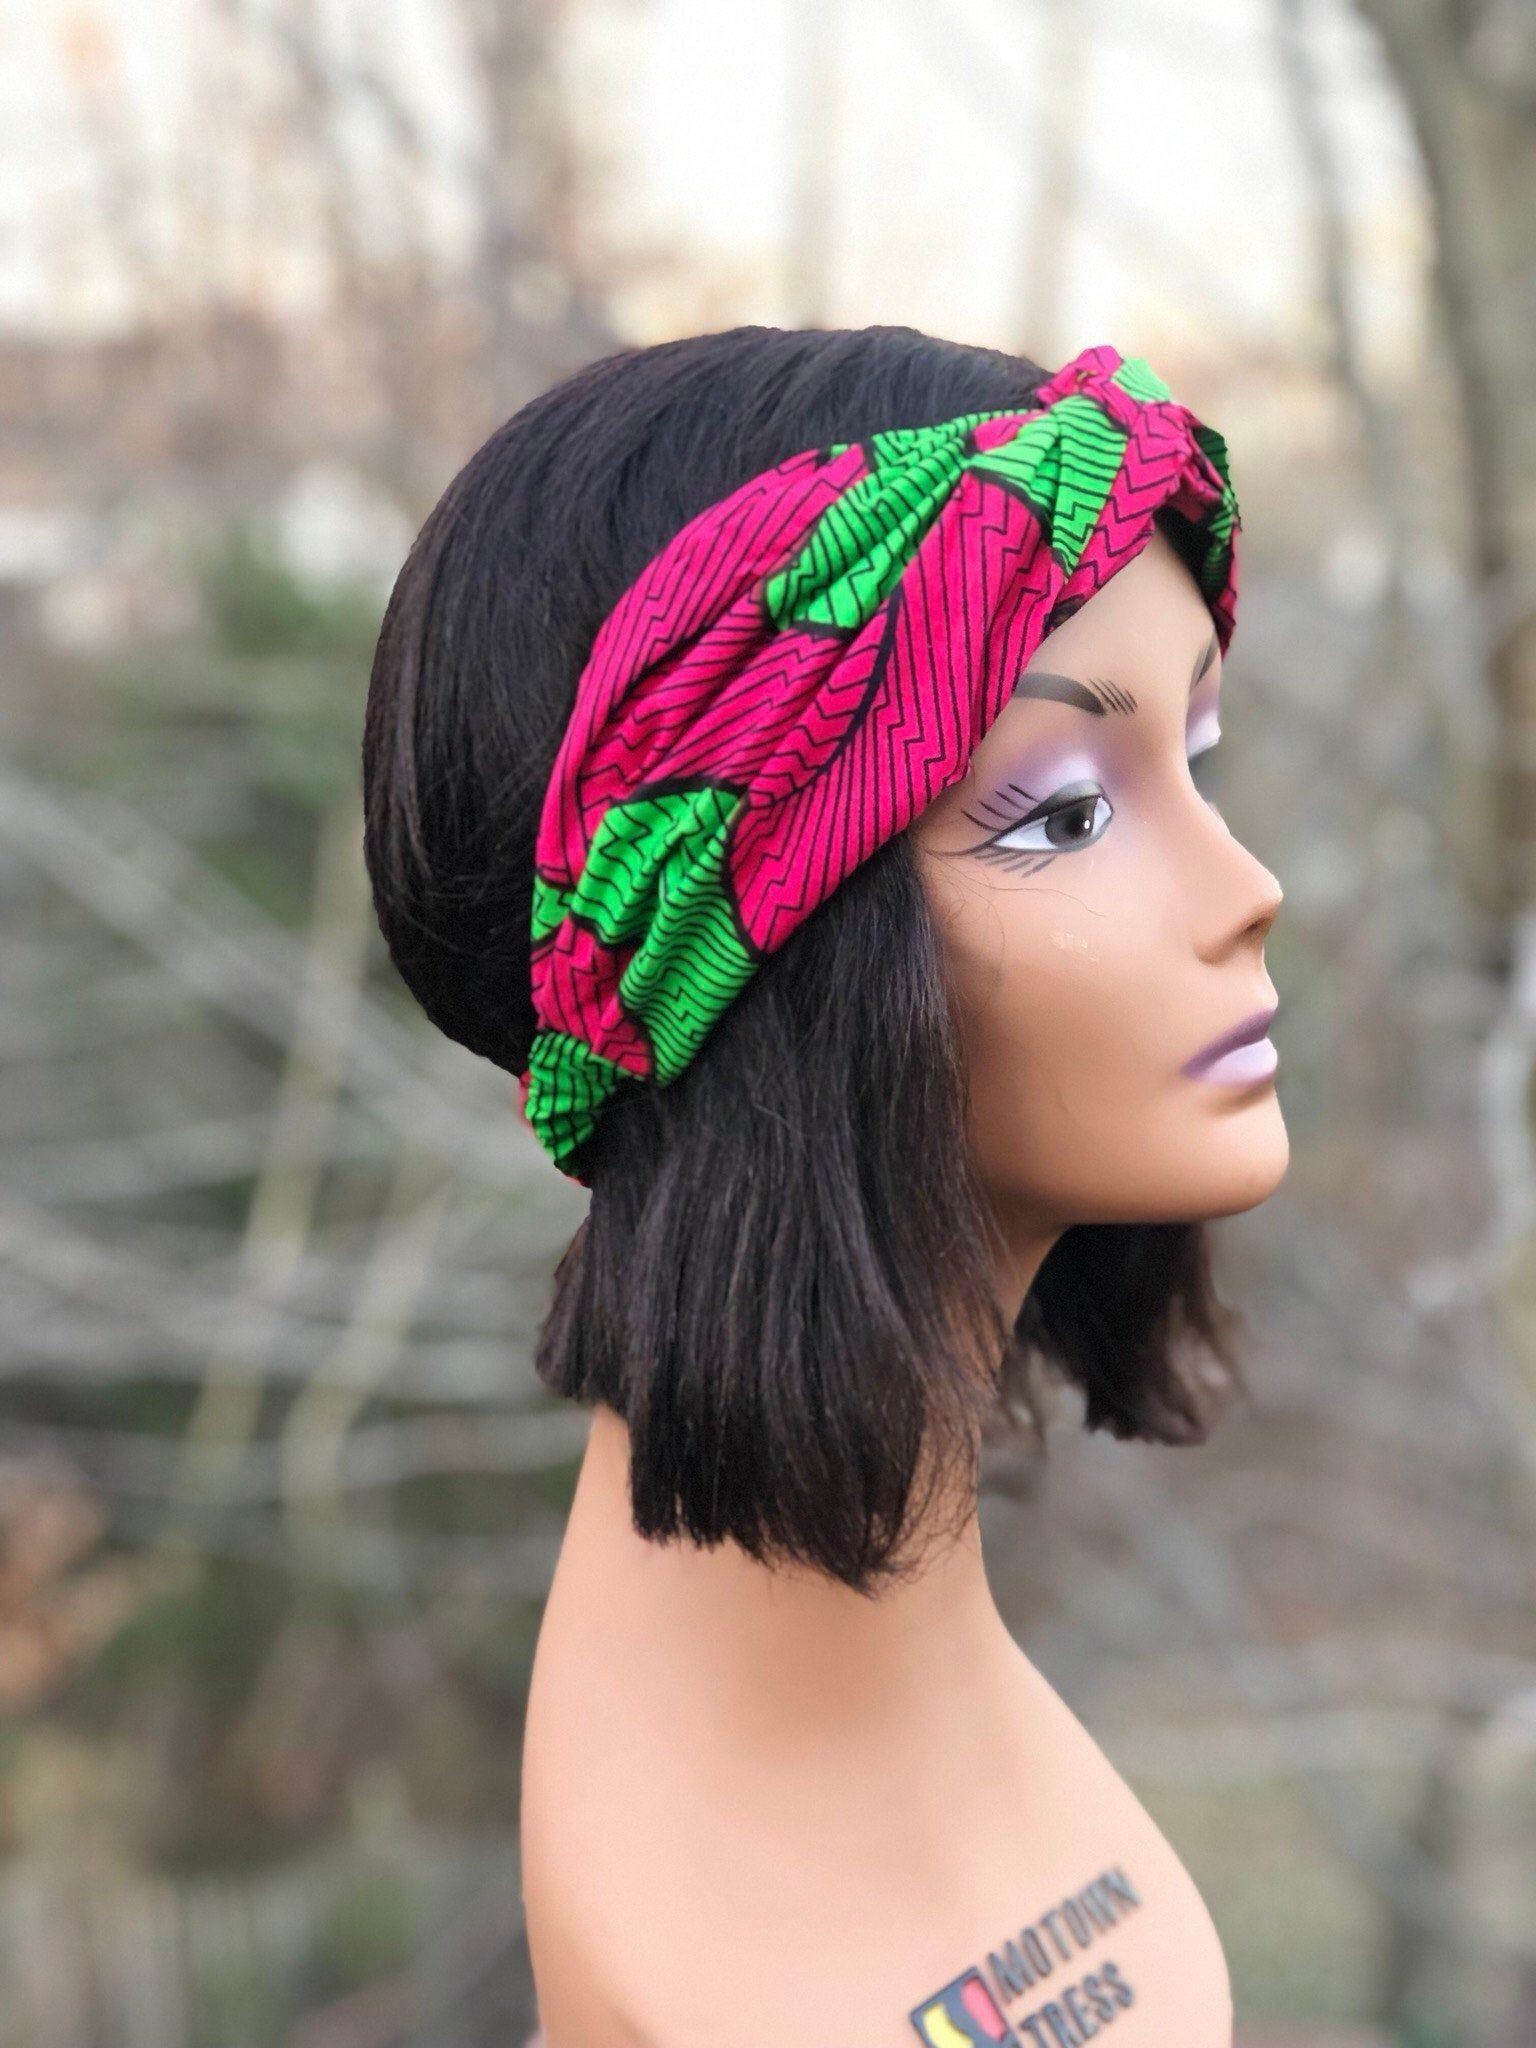 Pink Green Women's Head band - Wide HeadBand - Yoga Headbands - Boho Head wrap - Female Scarf- Hair Accessories - Turban - Workout bandanna